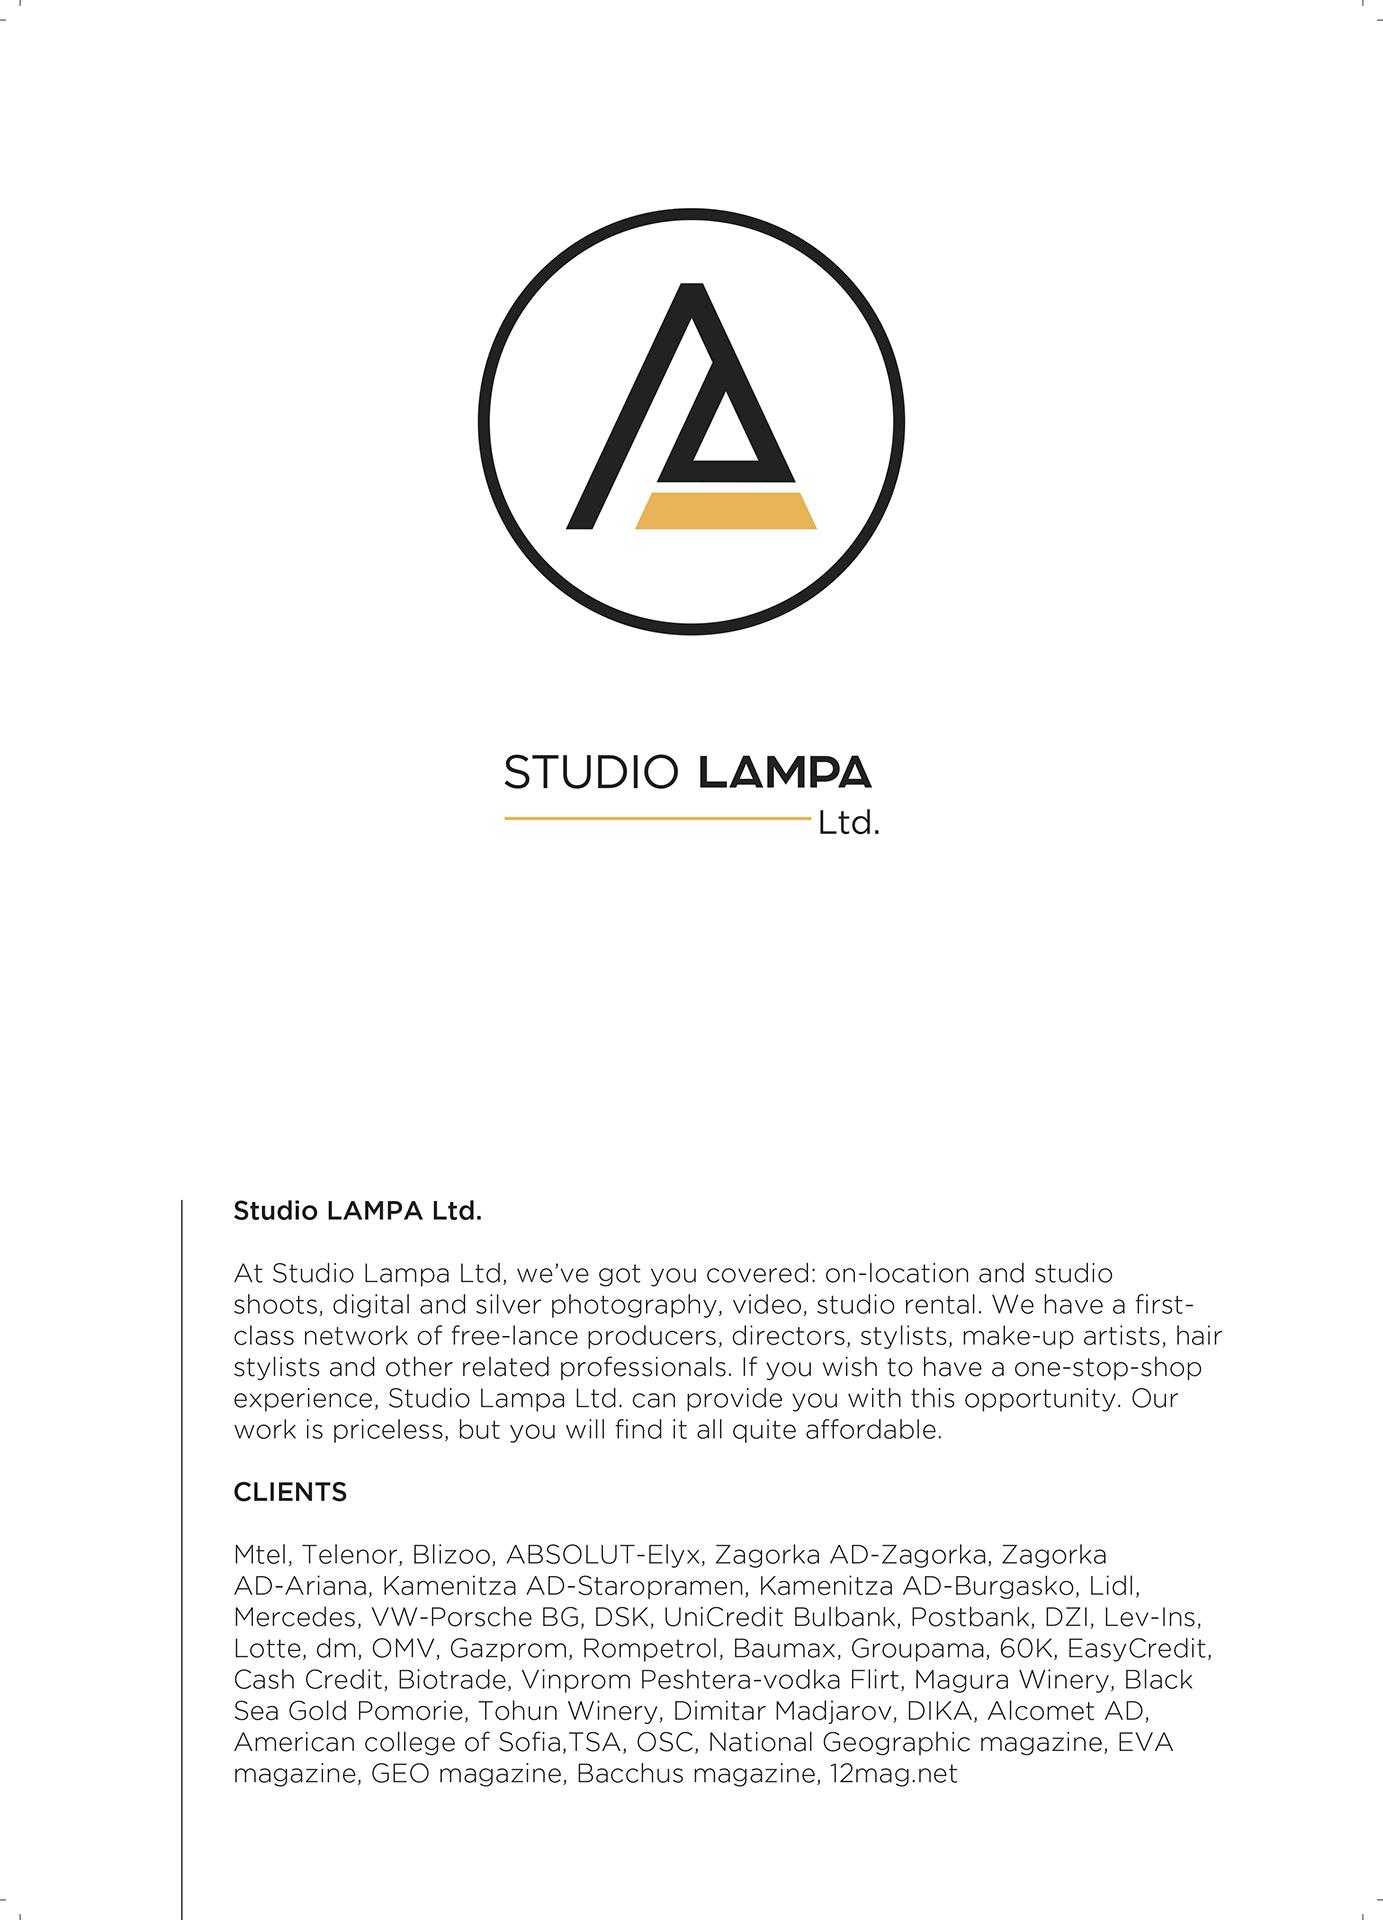 20170612-portfolio-studiolampa-print 1